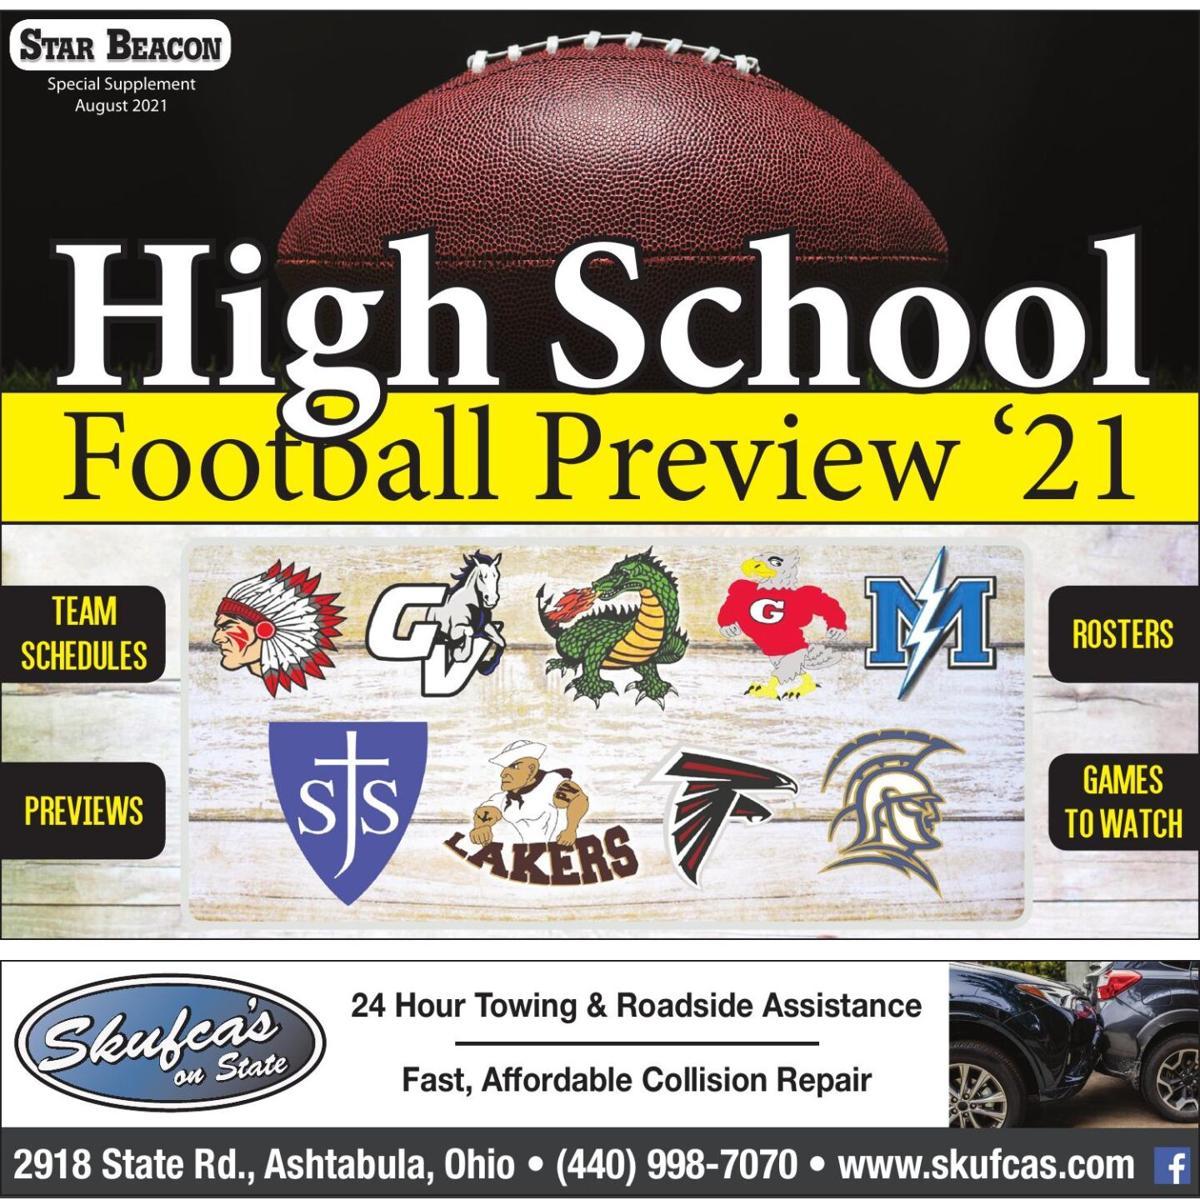 High School Football Preview 2021